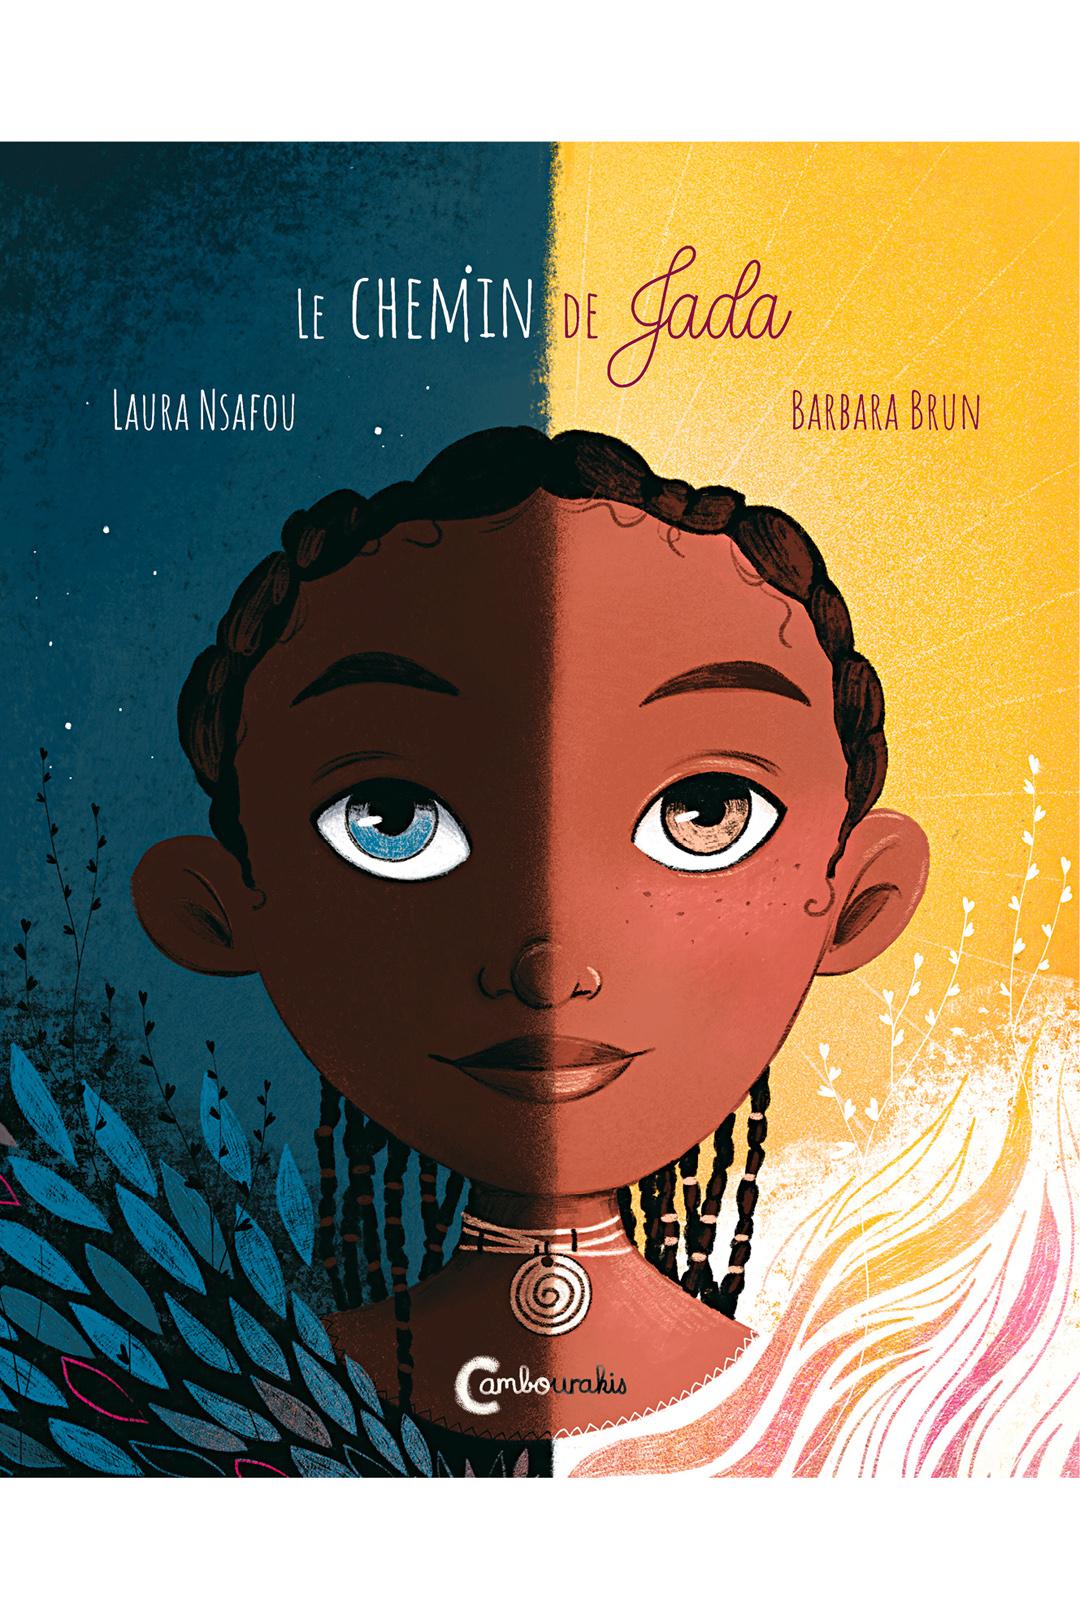 Le chemin de Jada, de Laura Nsafou et Barbara Brun